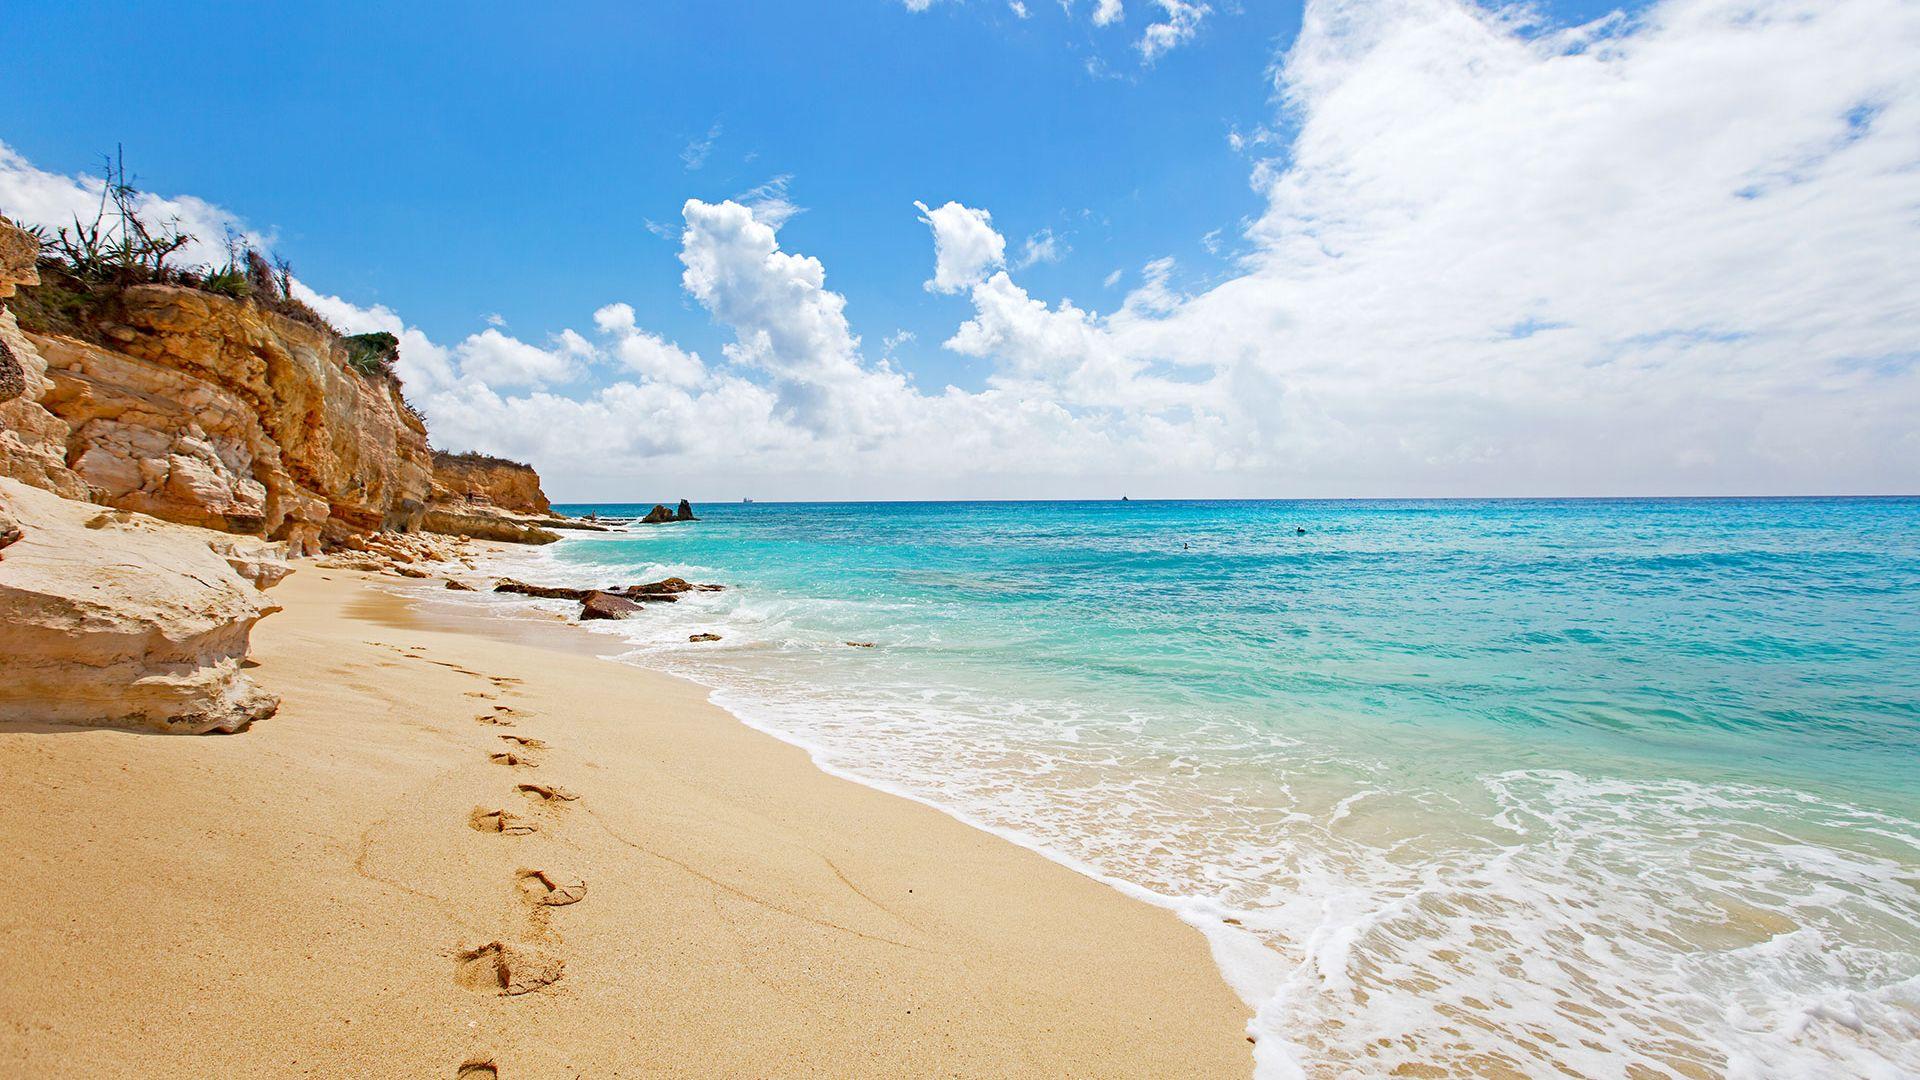 Revelion 2022 - Sejur plaja Sint Maarten, 9 zile